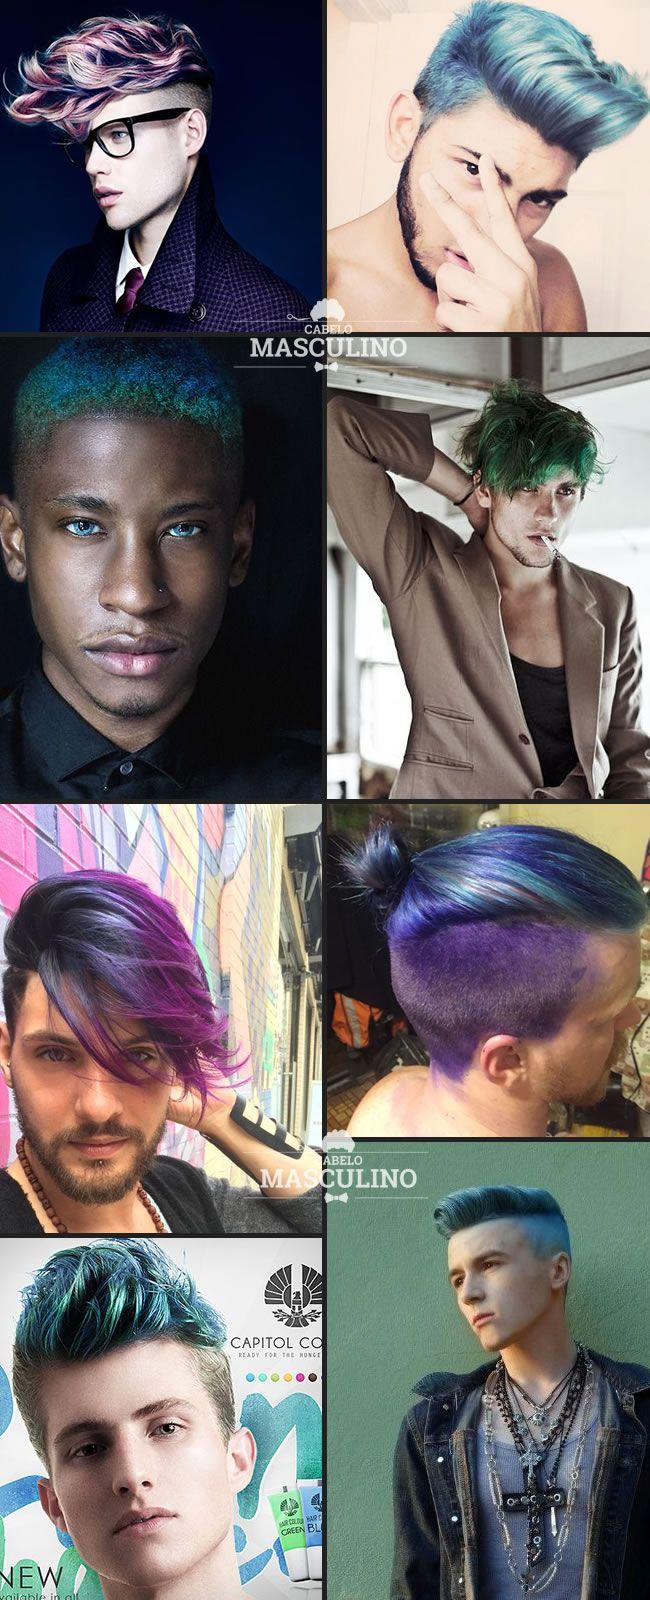 Muita cor! Cabelo masculino colorido é tendência para 2016